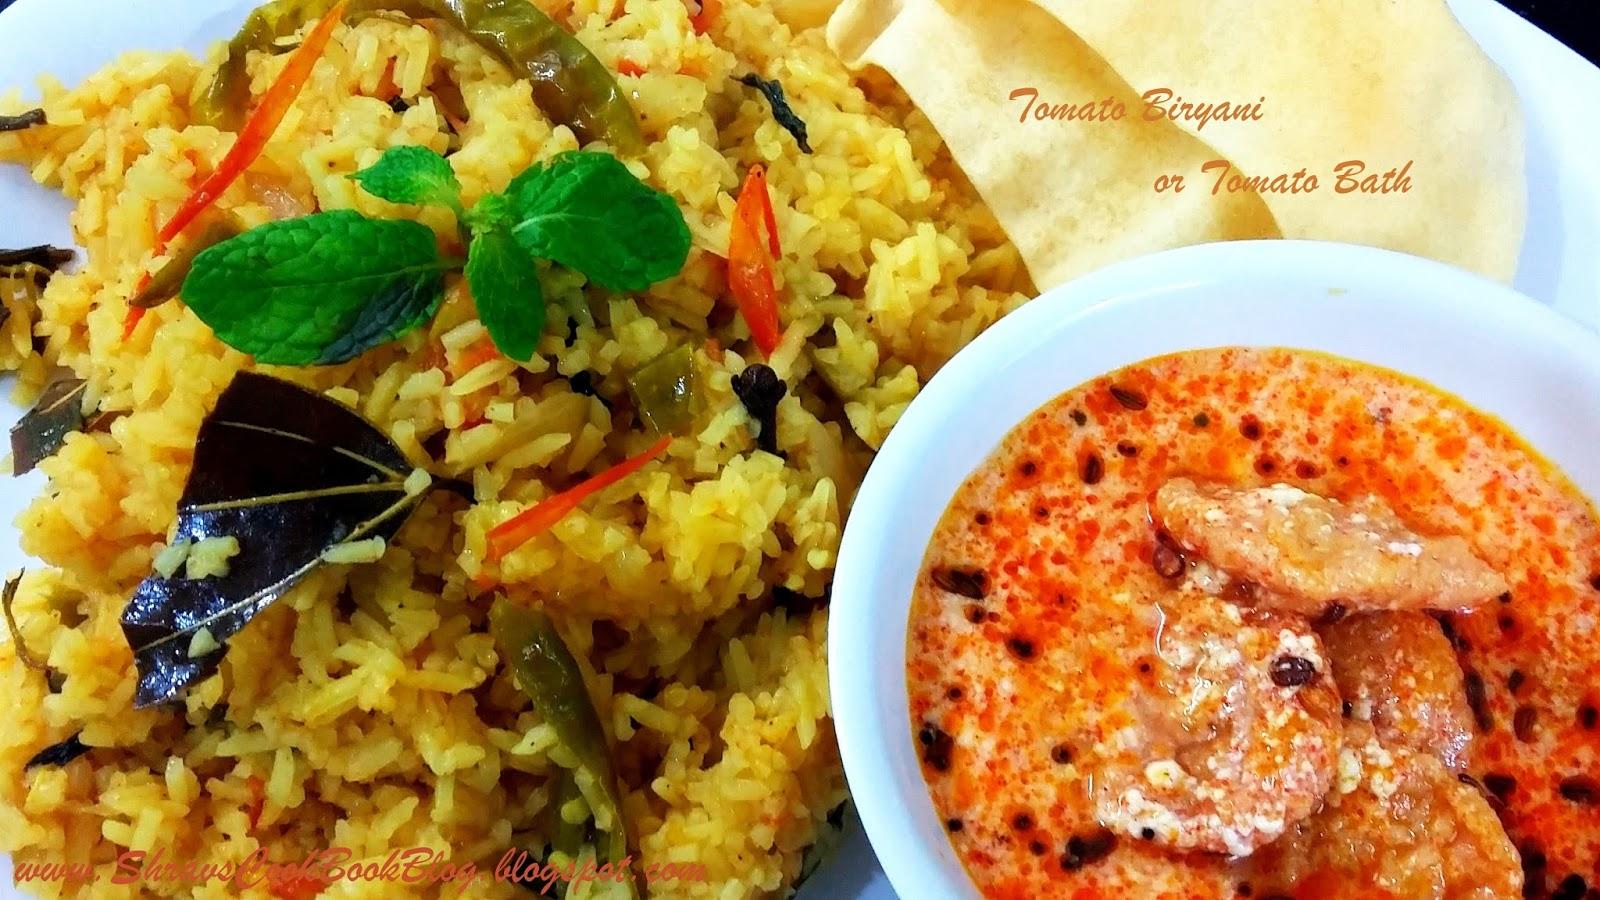 Healthy recipes tomato biryani how to make tomato rice biryani tomato biryani tomato bath tomato pulao tomato rice ccuart Choice Image